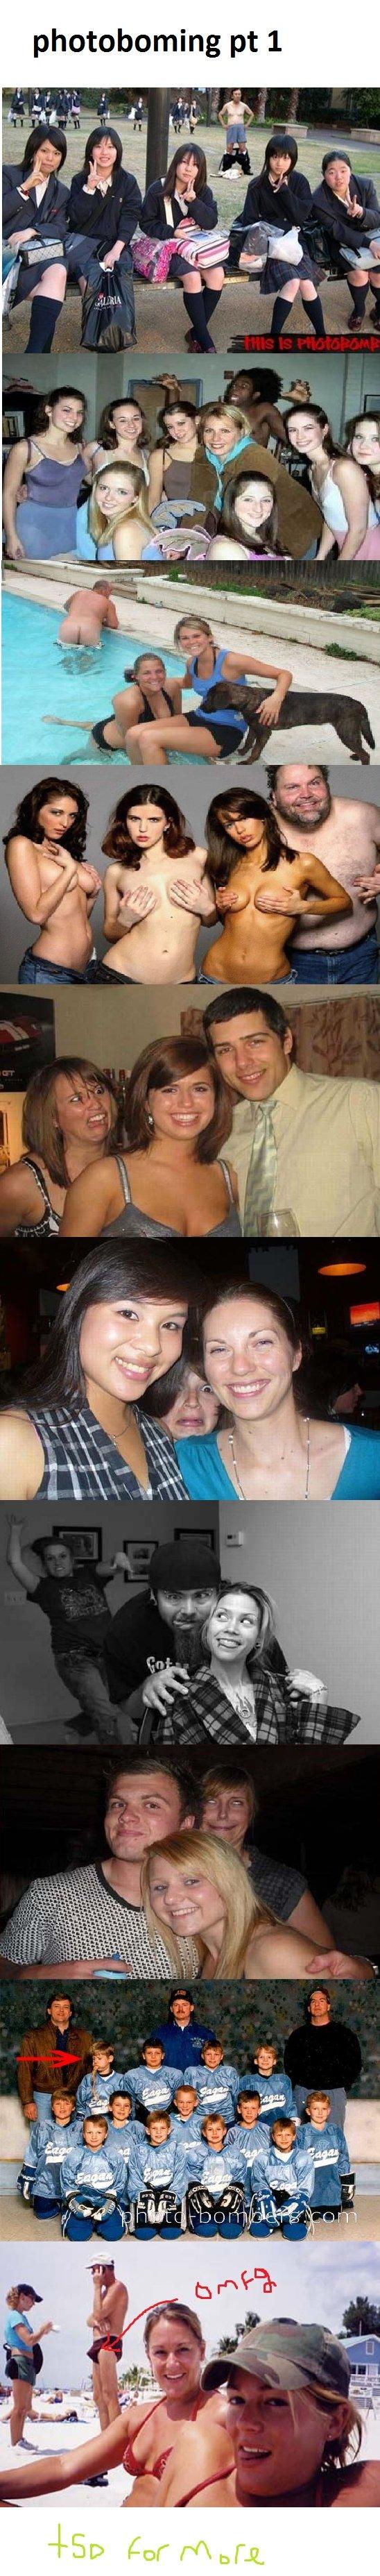 "photoboming. lol. photoboming pt """